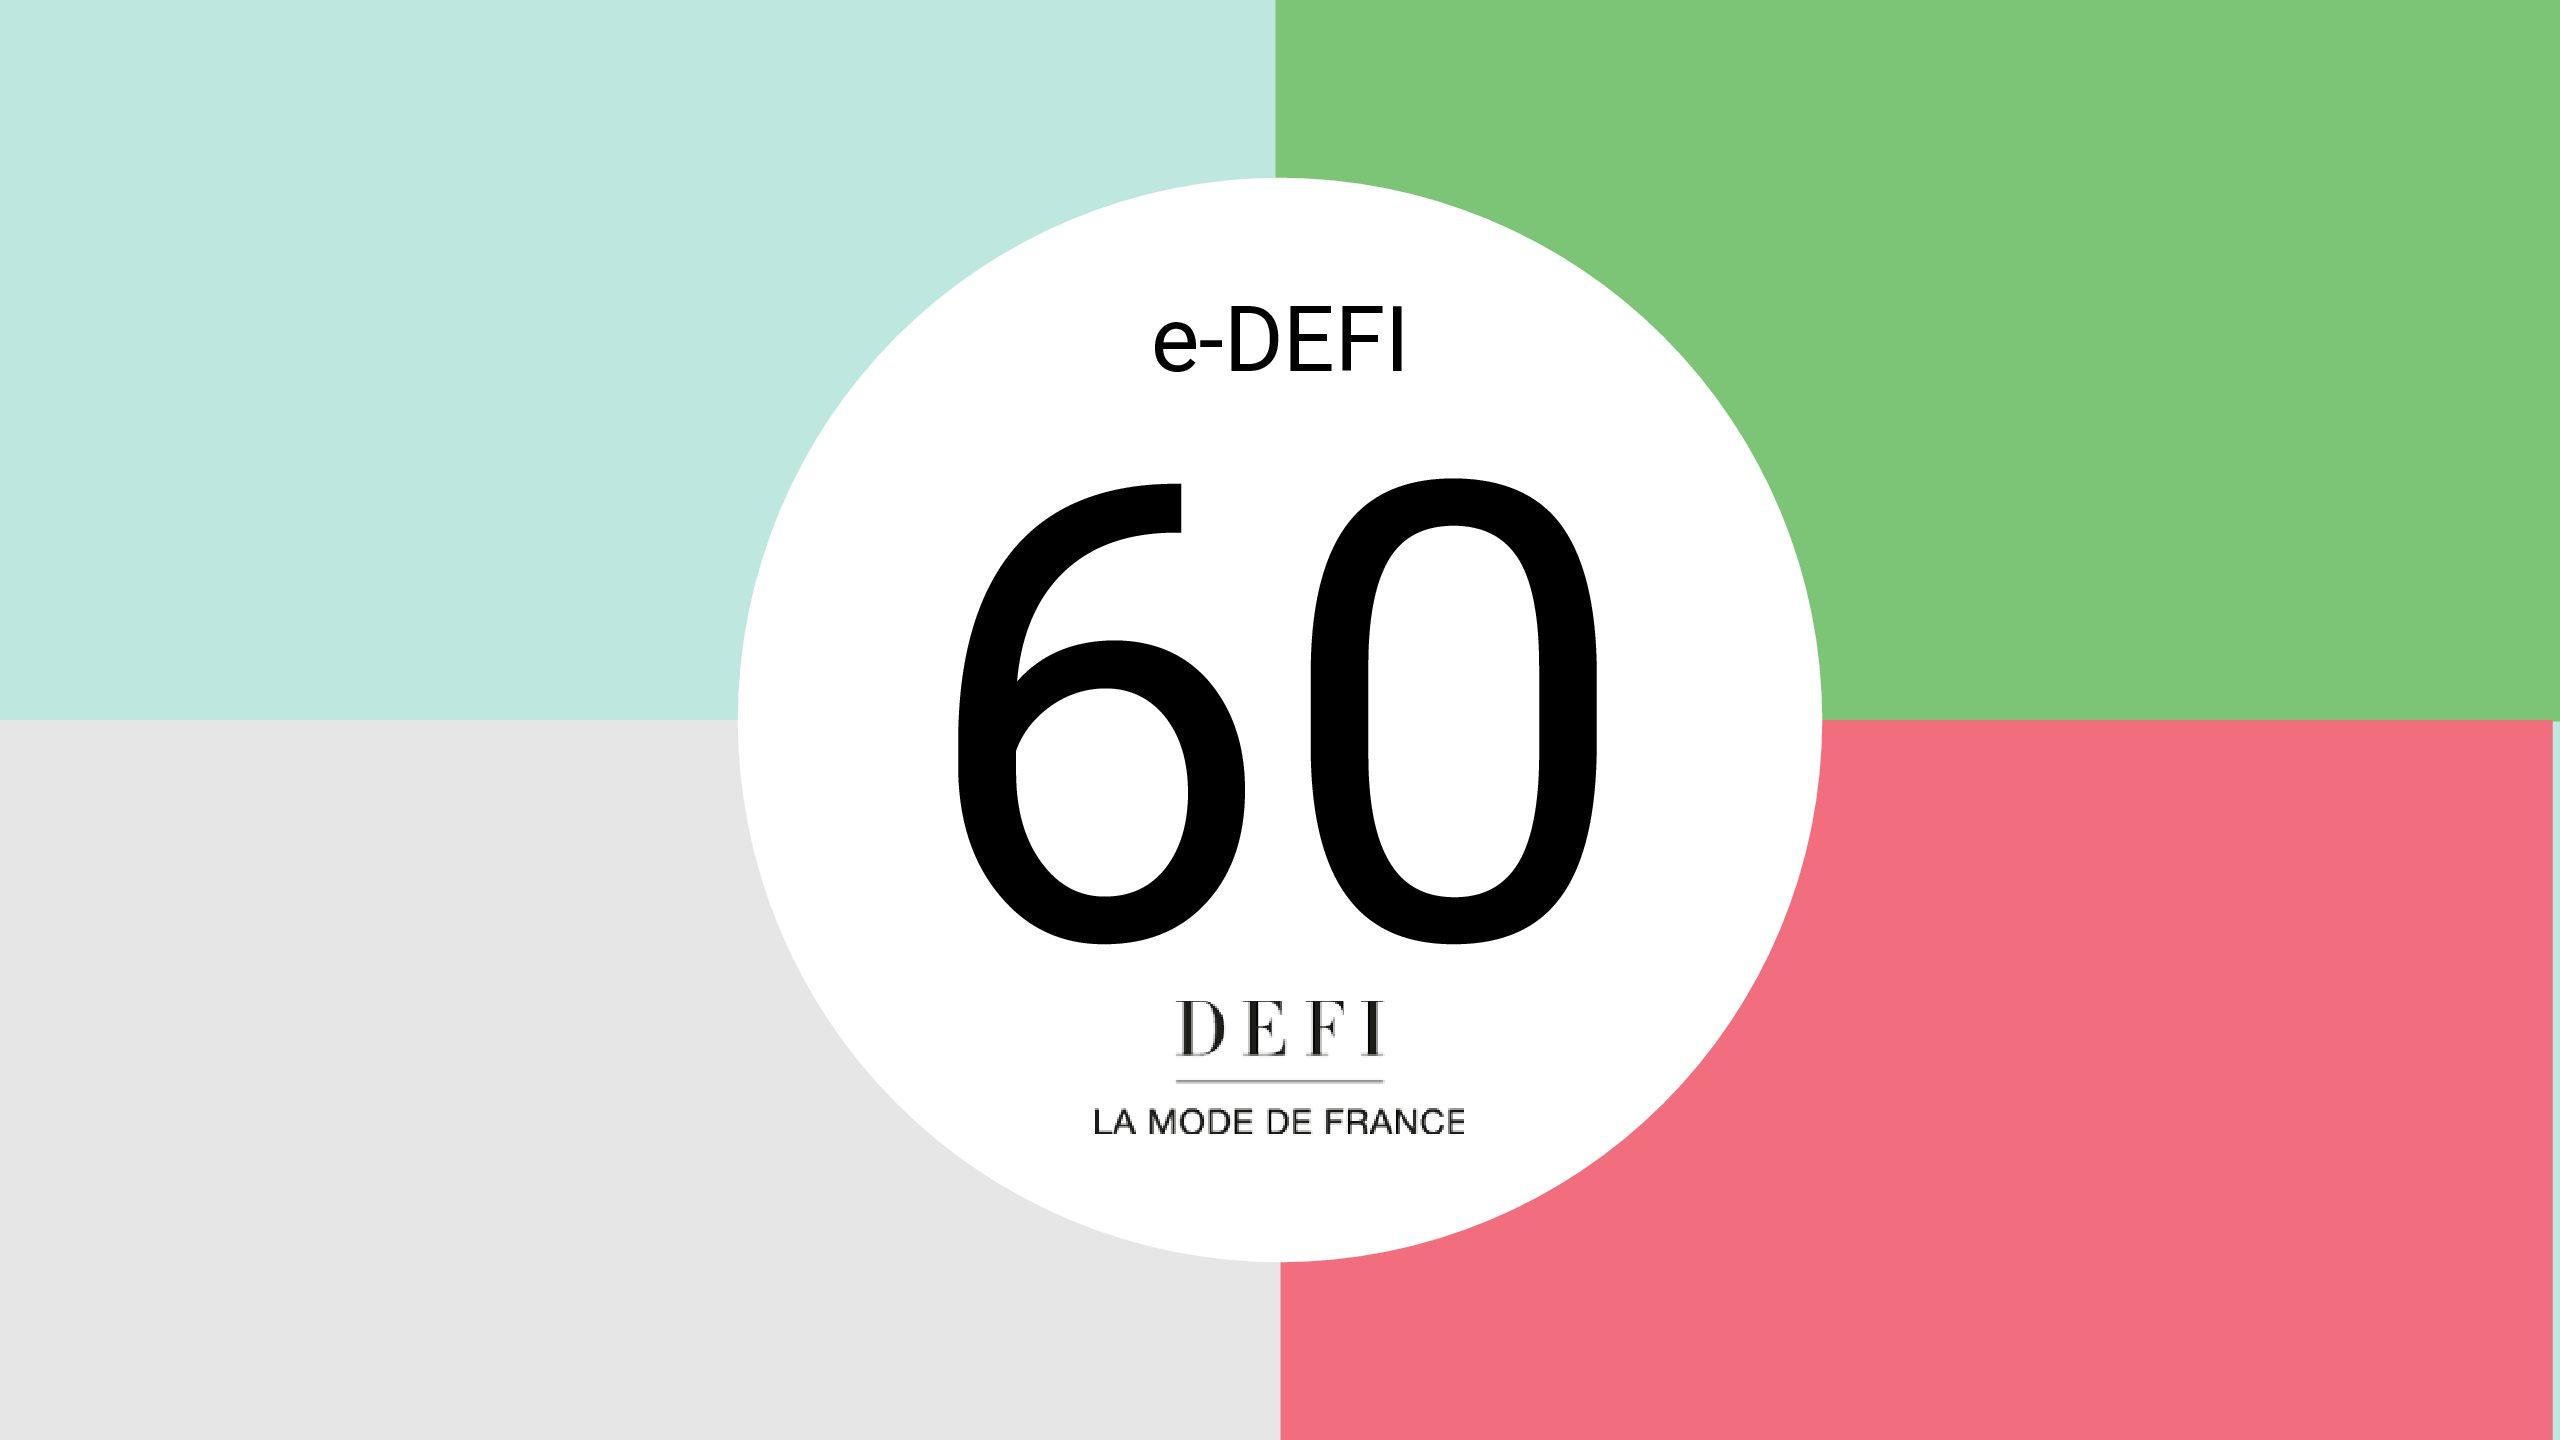 Bulletin e-DEFI #60